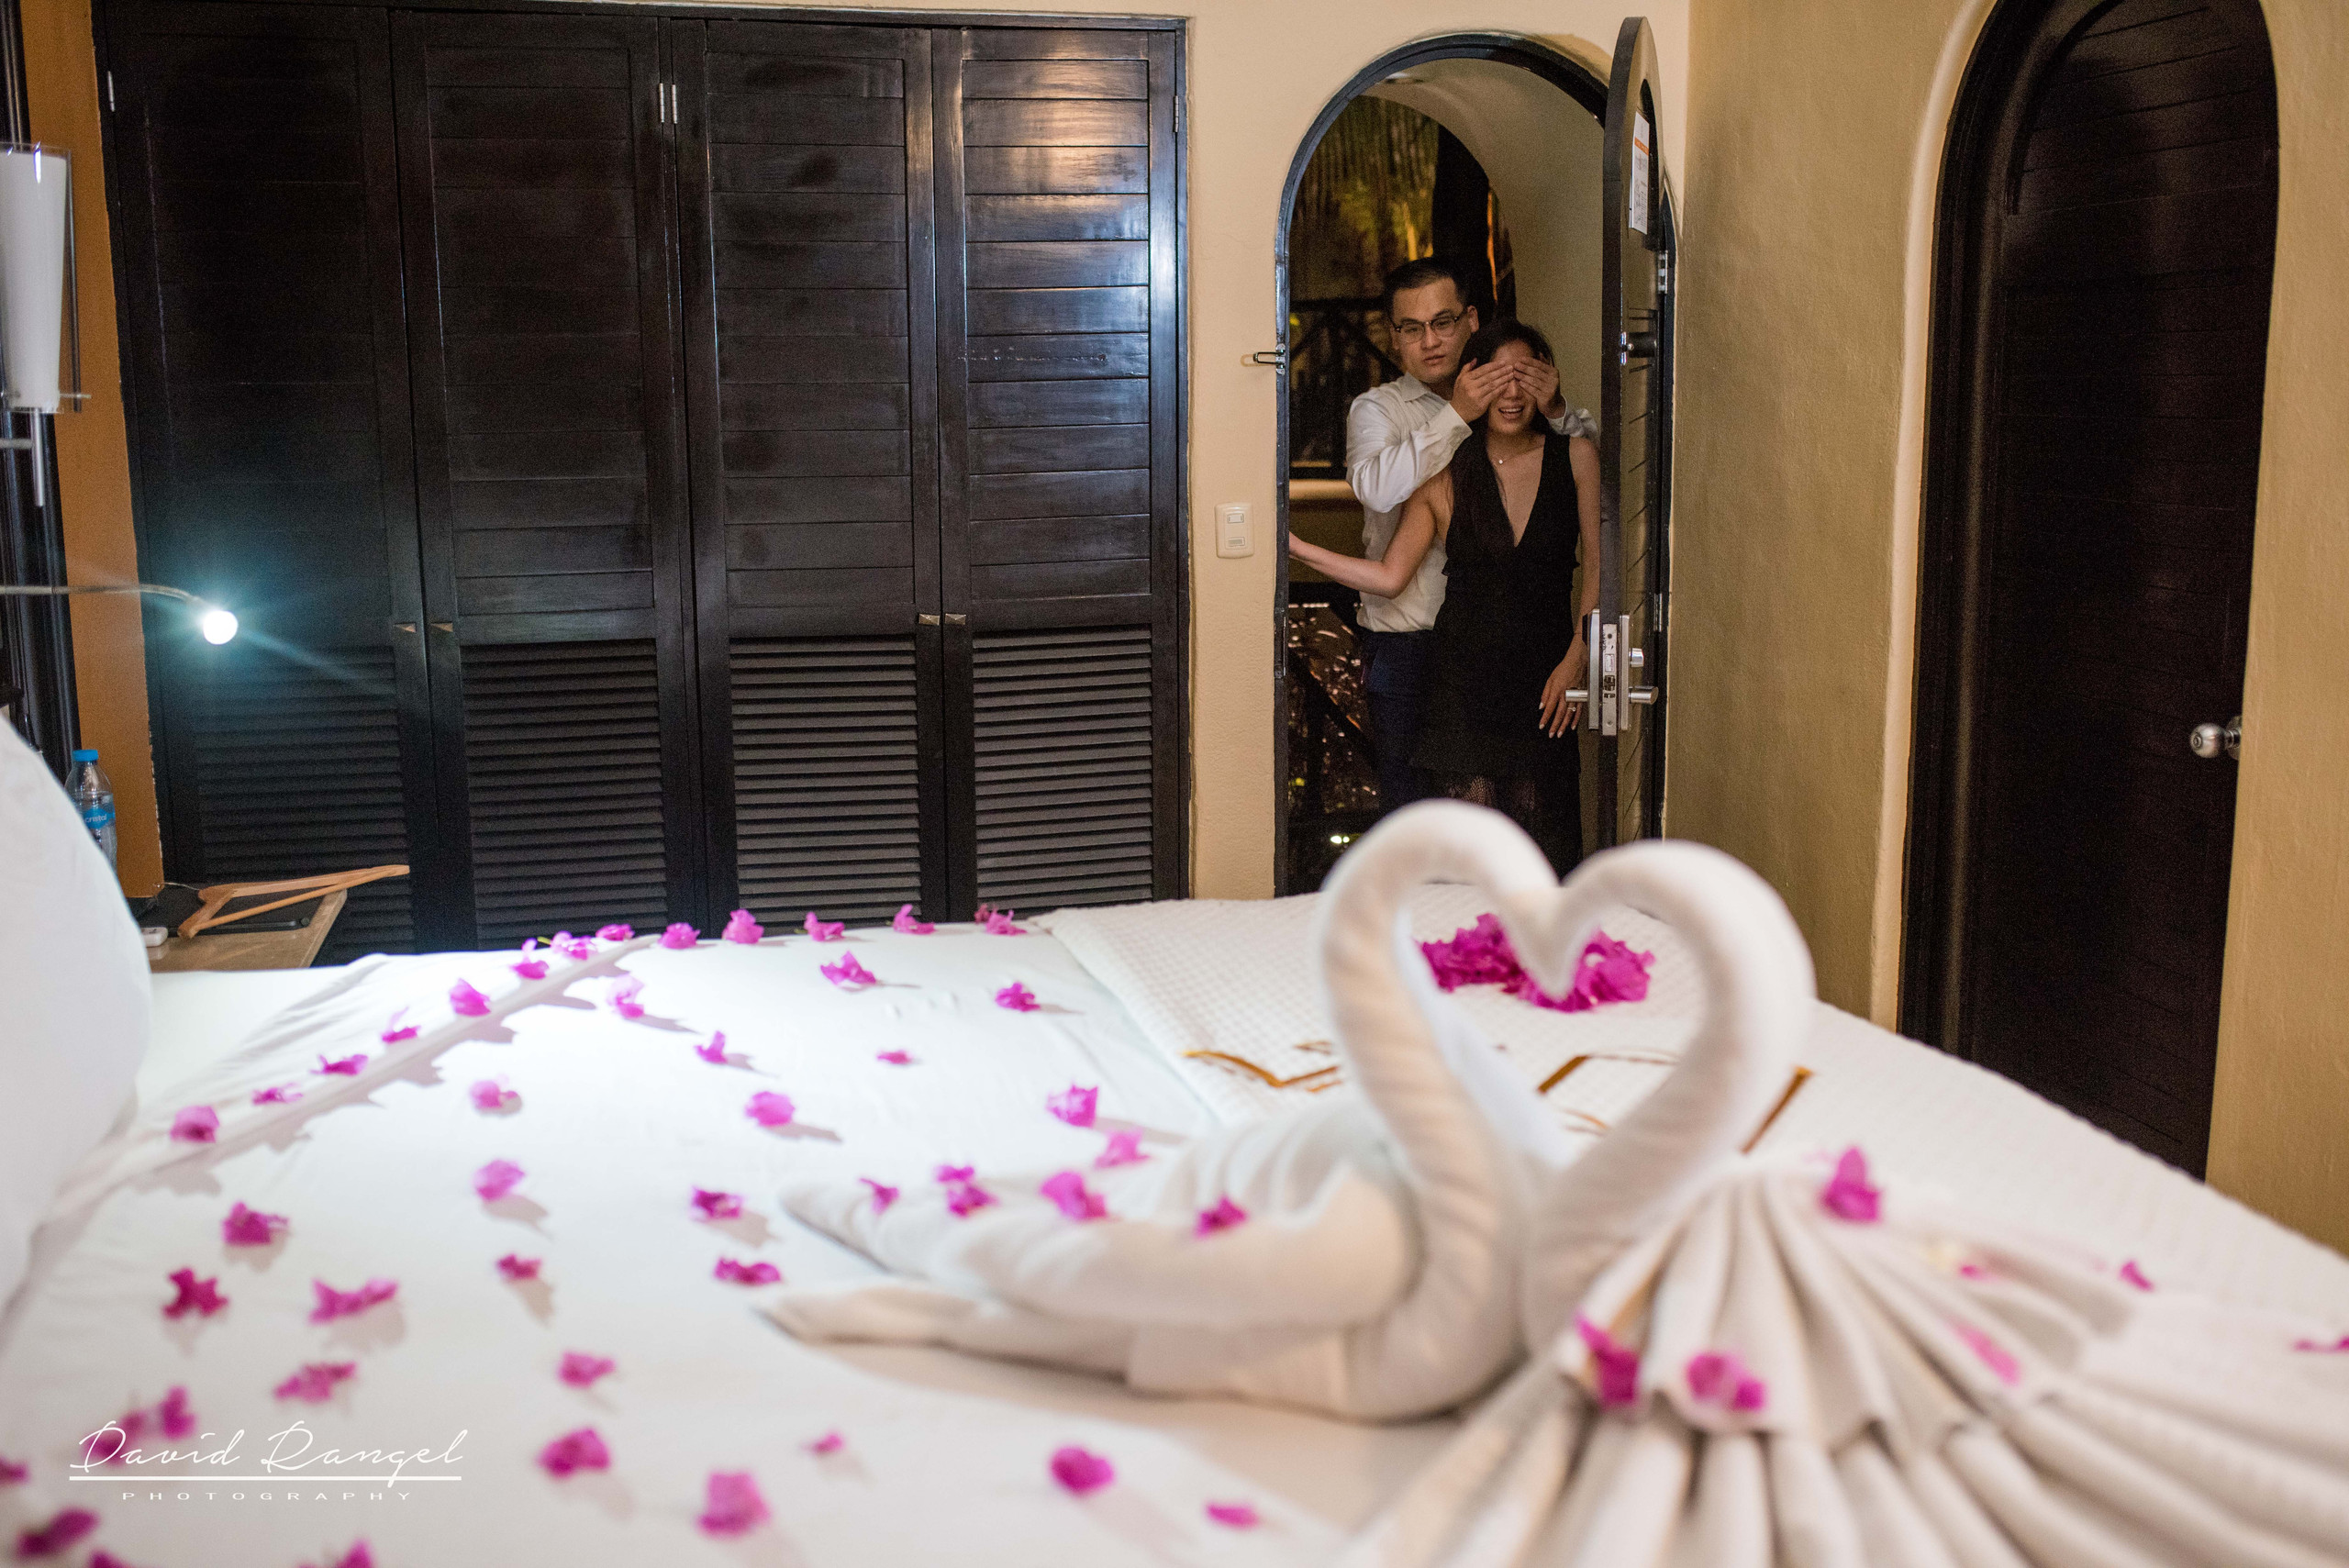 engagement+session+marriage+proposal+couple+night+photo+dorado+casitas+playa+del+carmen+photographer+destination+sorprise+room